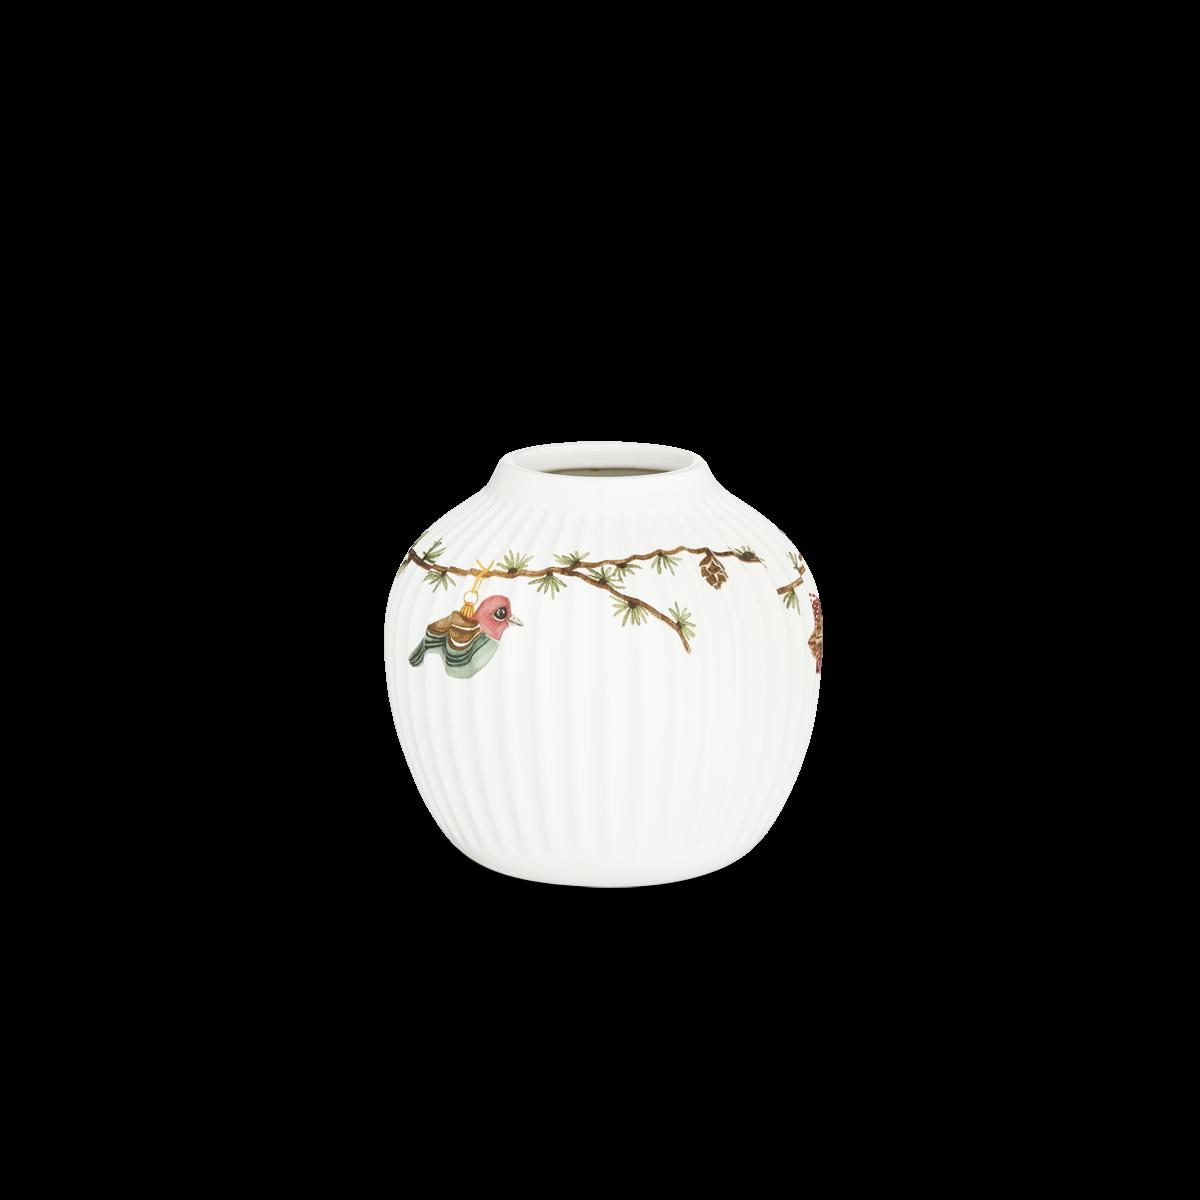 Kähler - Hammershøi Christmas Vase 13 cm - White With Deko (693209)